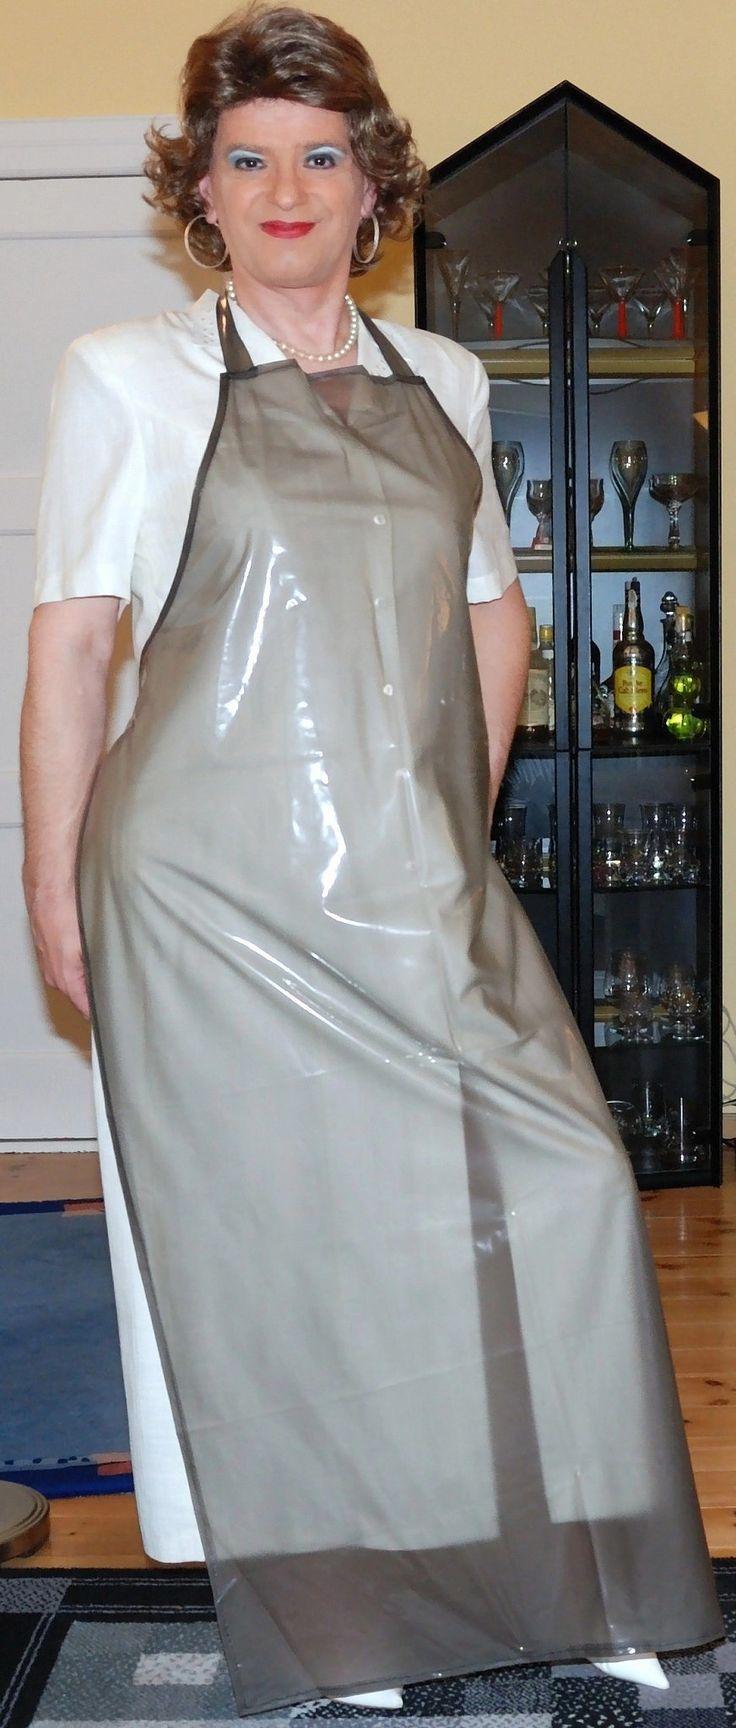 White rubber apron - Https Flic Kr P Drwdcz Birgit012921